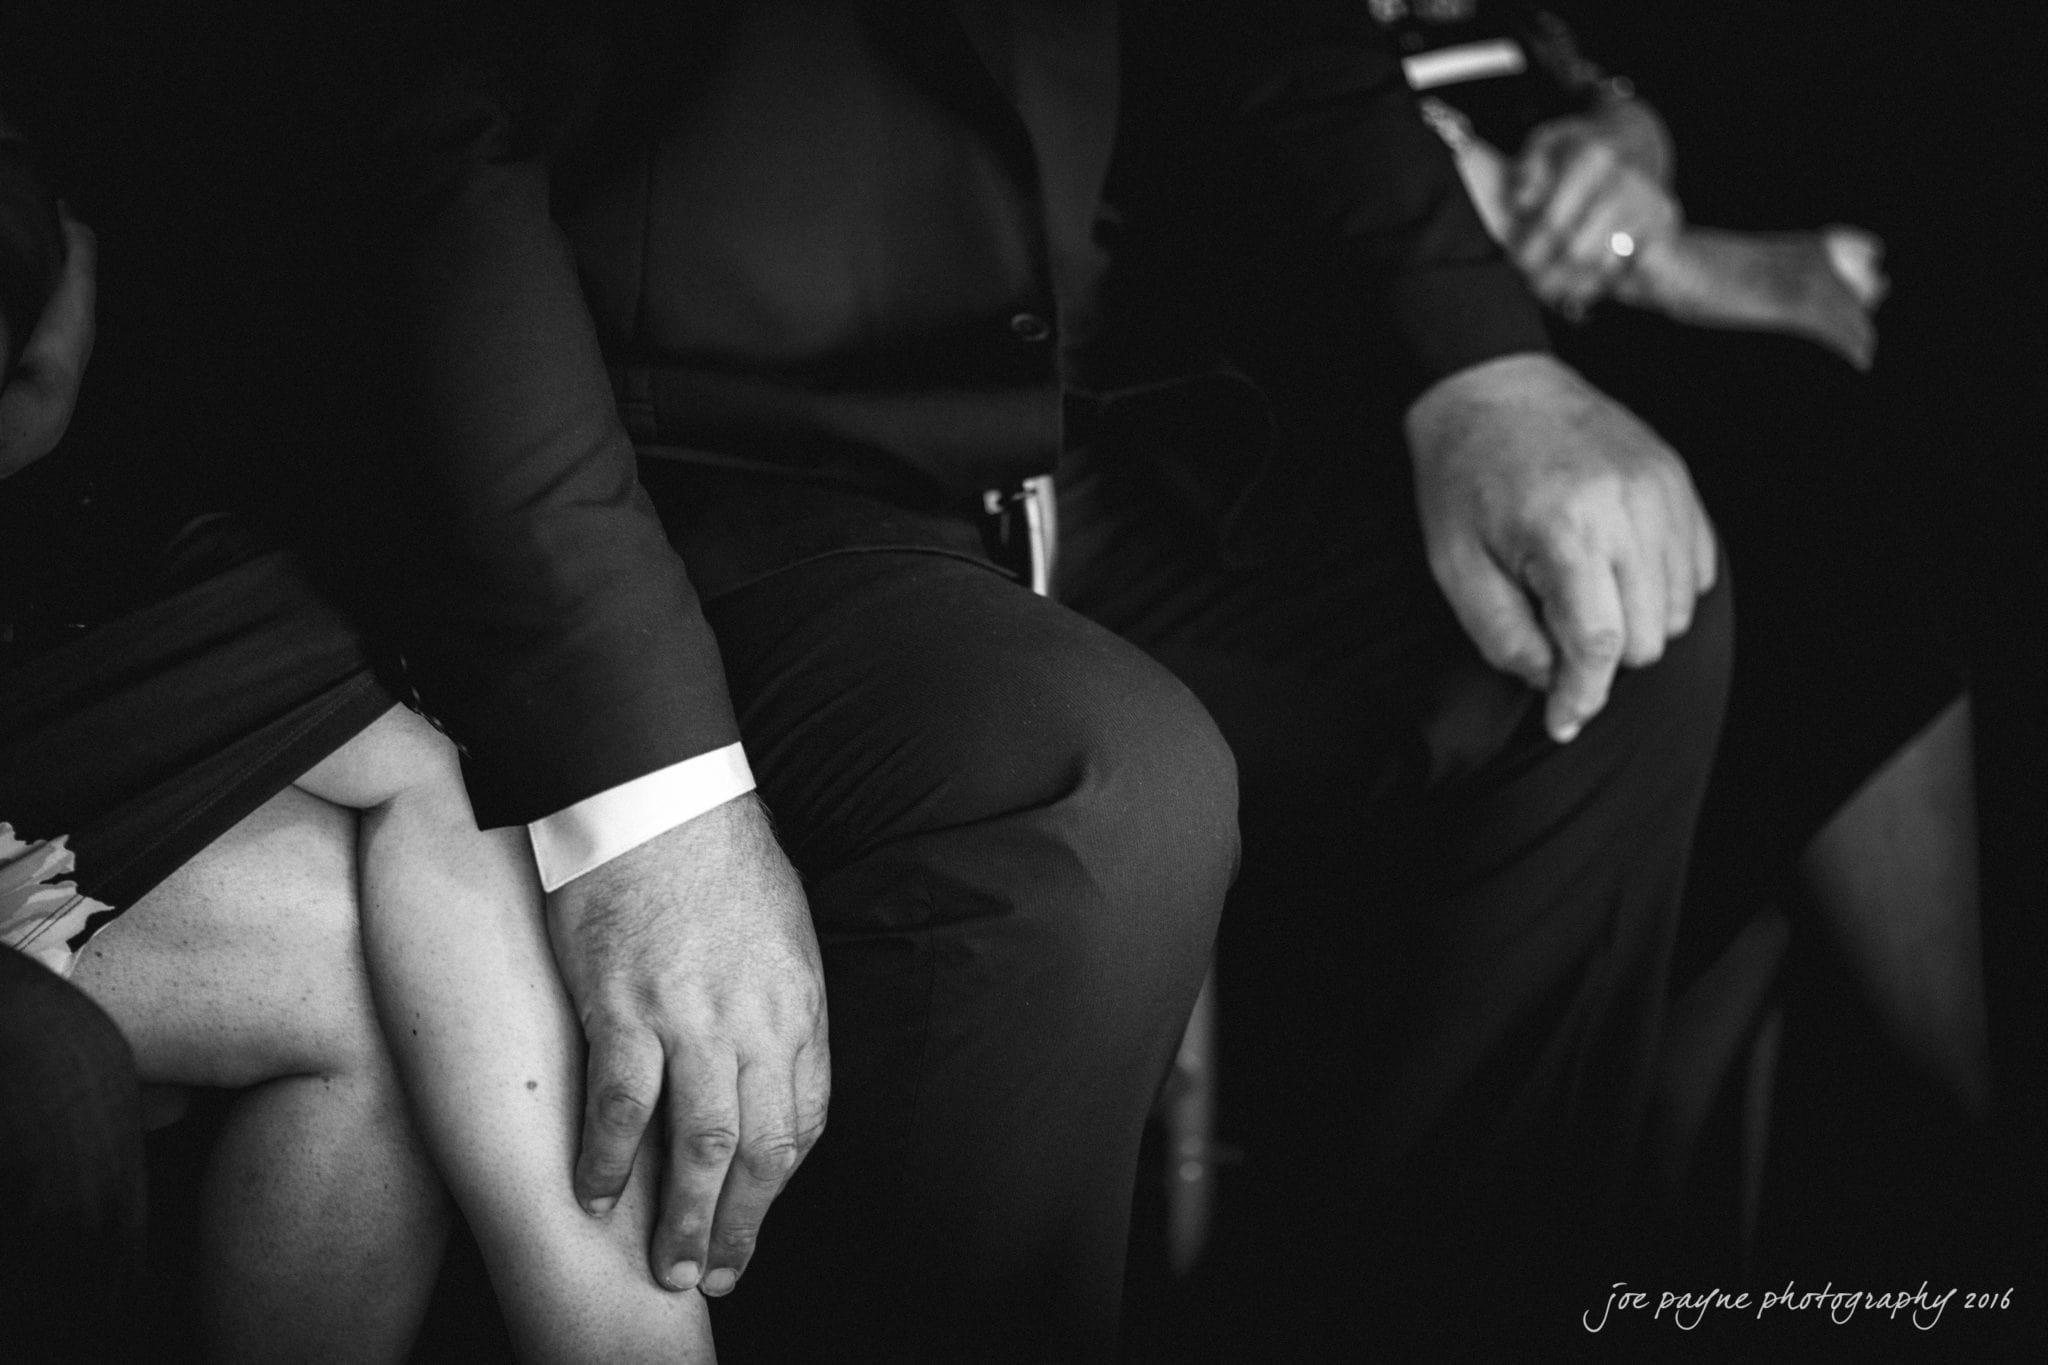 city-club-raleigh-wedding-photography-lauren-adam-27